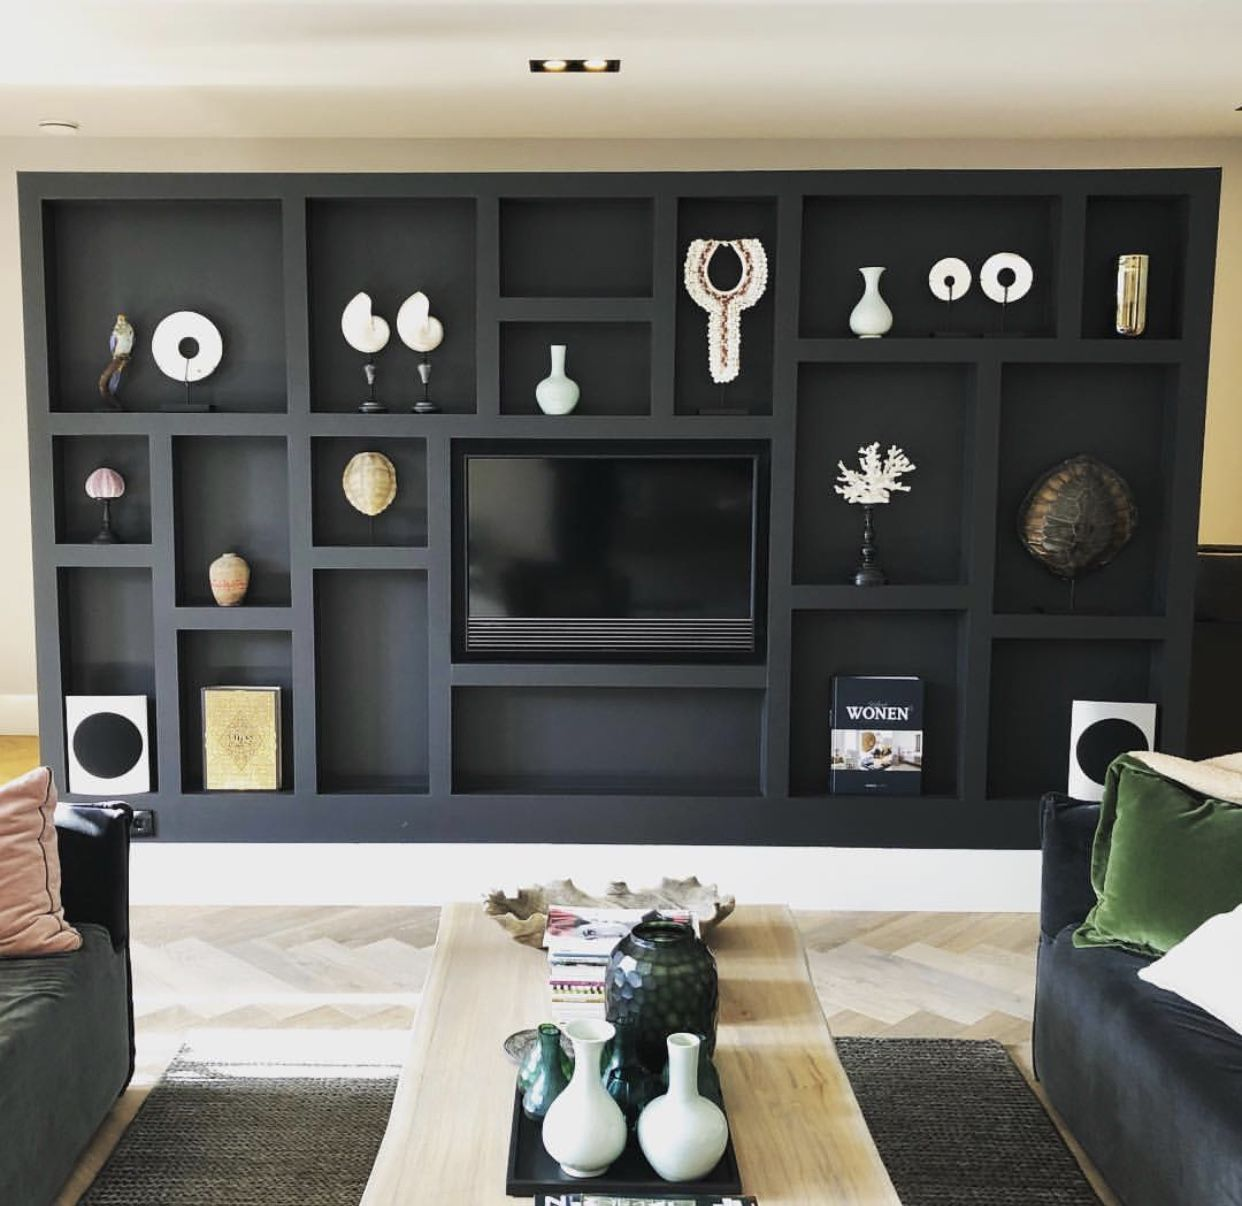 Kast woonkamer | Ev dekorasyonu | Pinterest | Black interior design ...